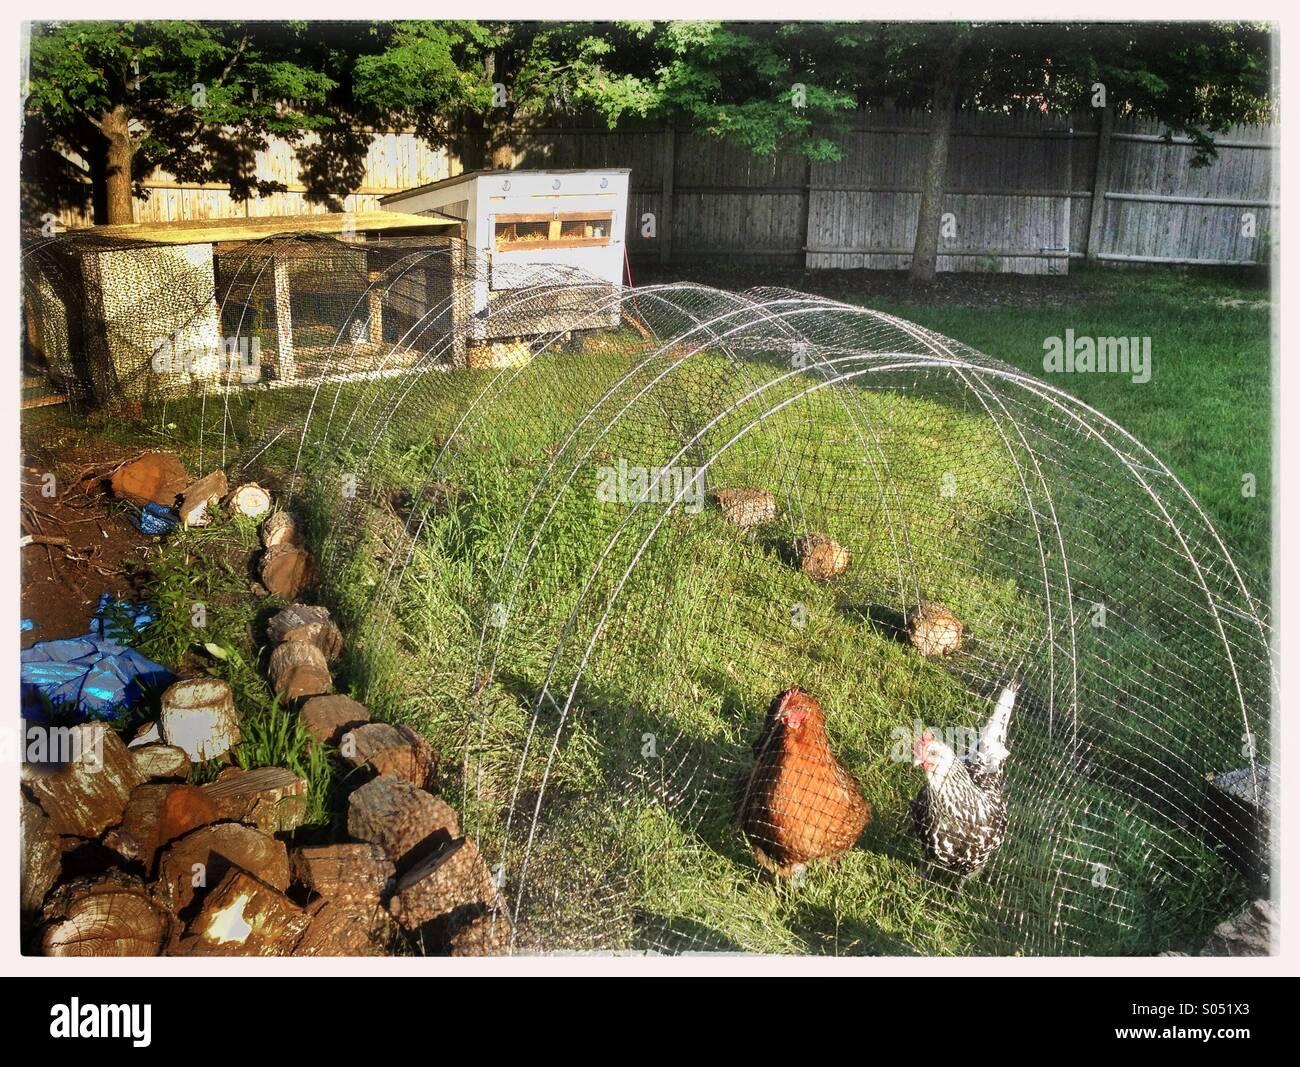 Raising Chickens Stock Photos & Raising Chickens Stock